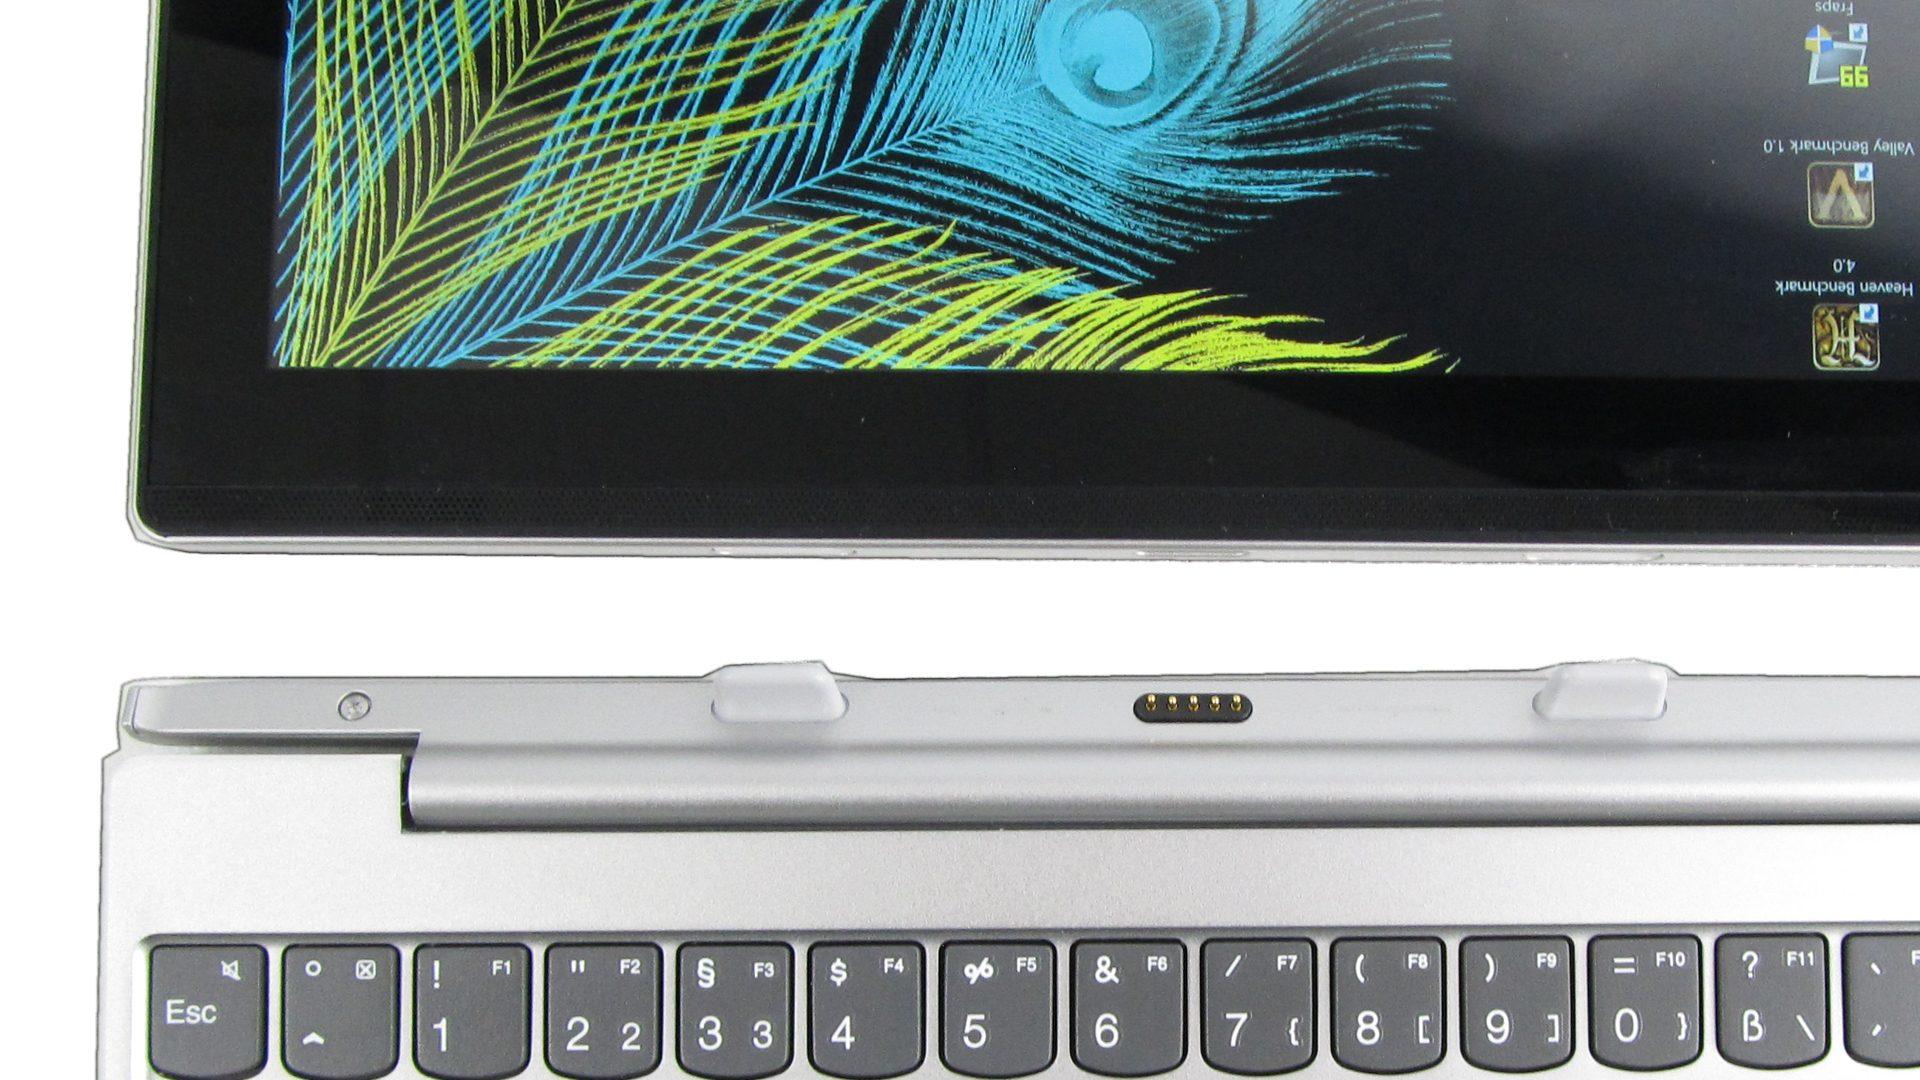 Lenovo-MIX-320-10ICR_Tastatur_7